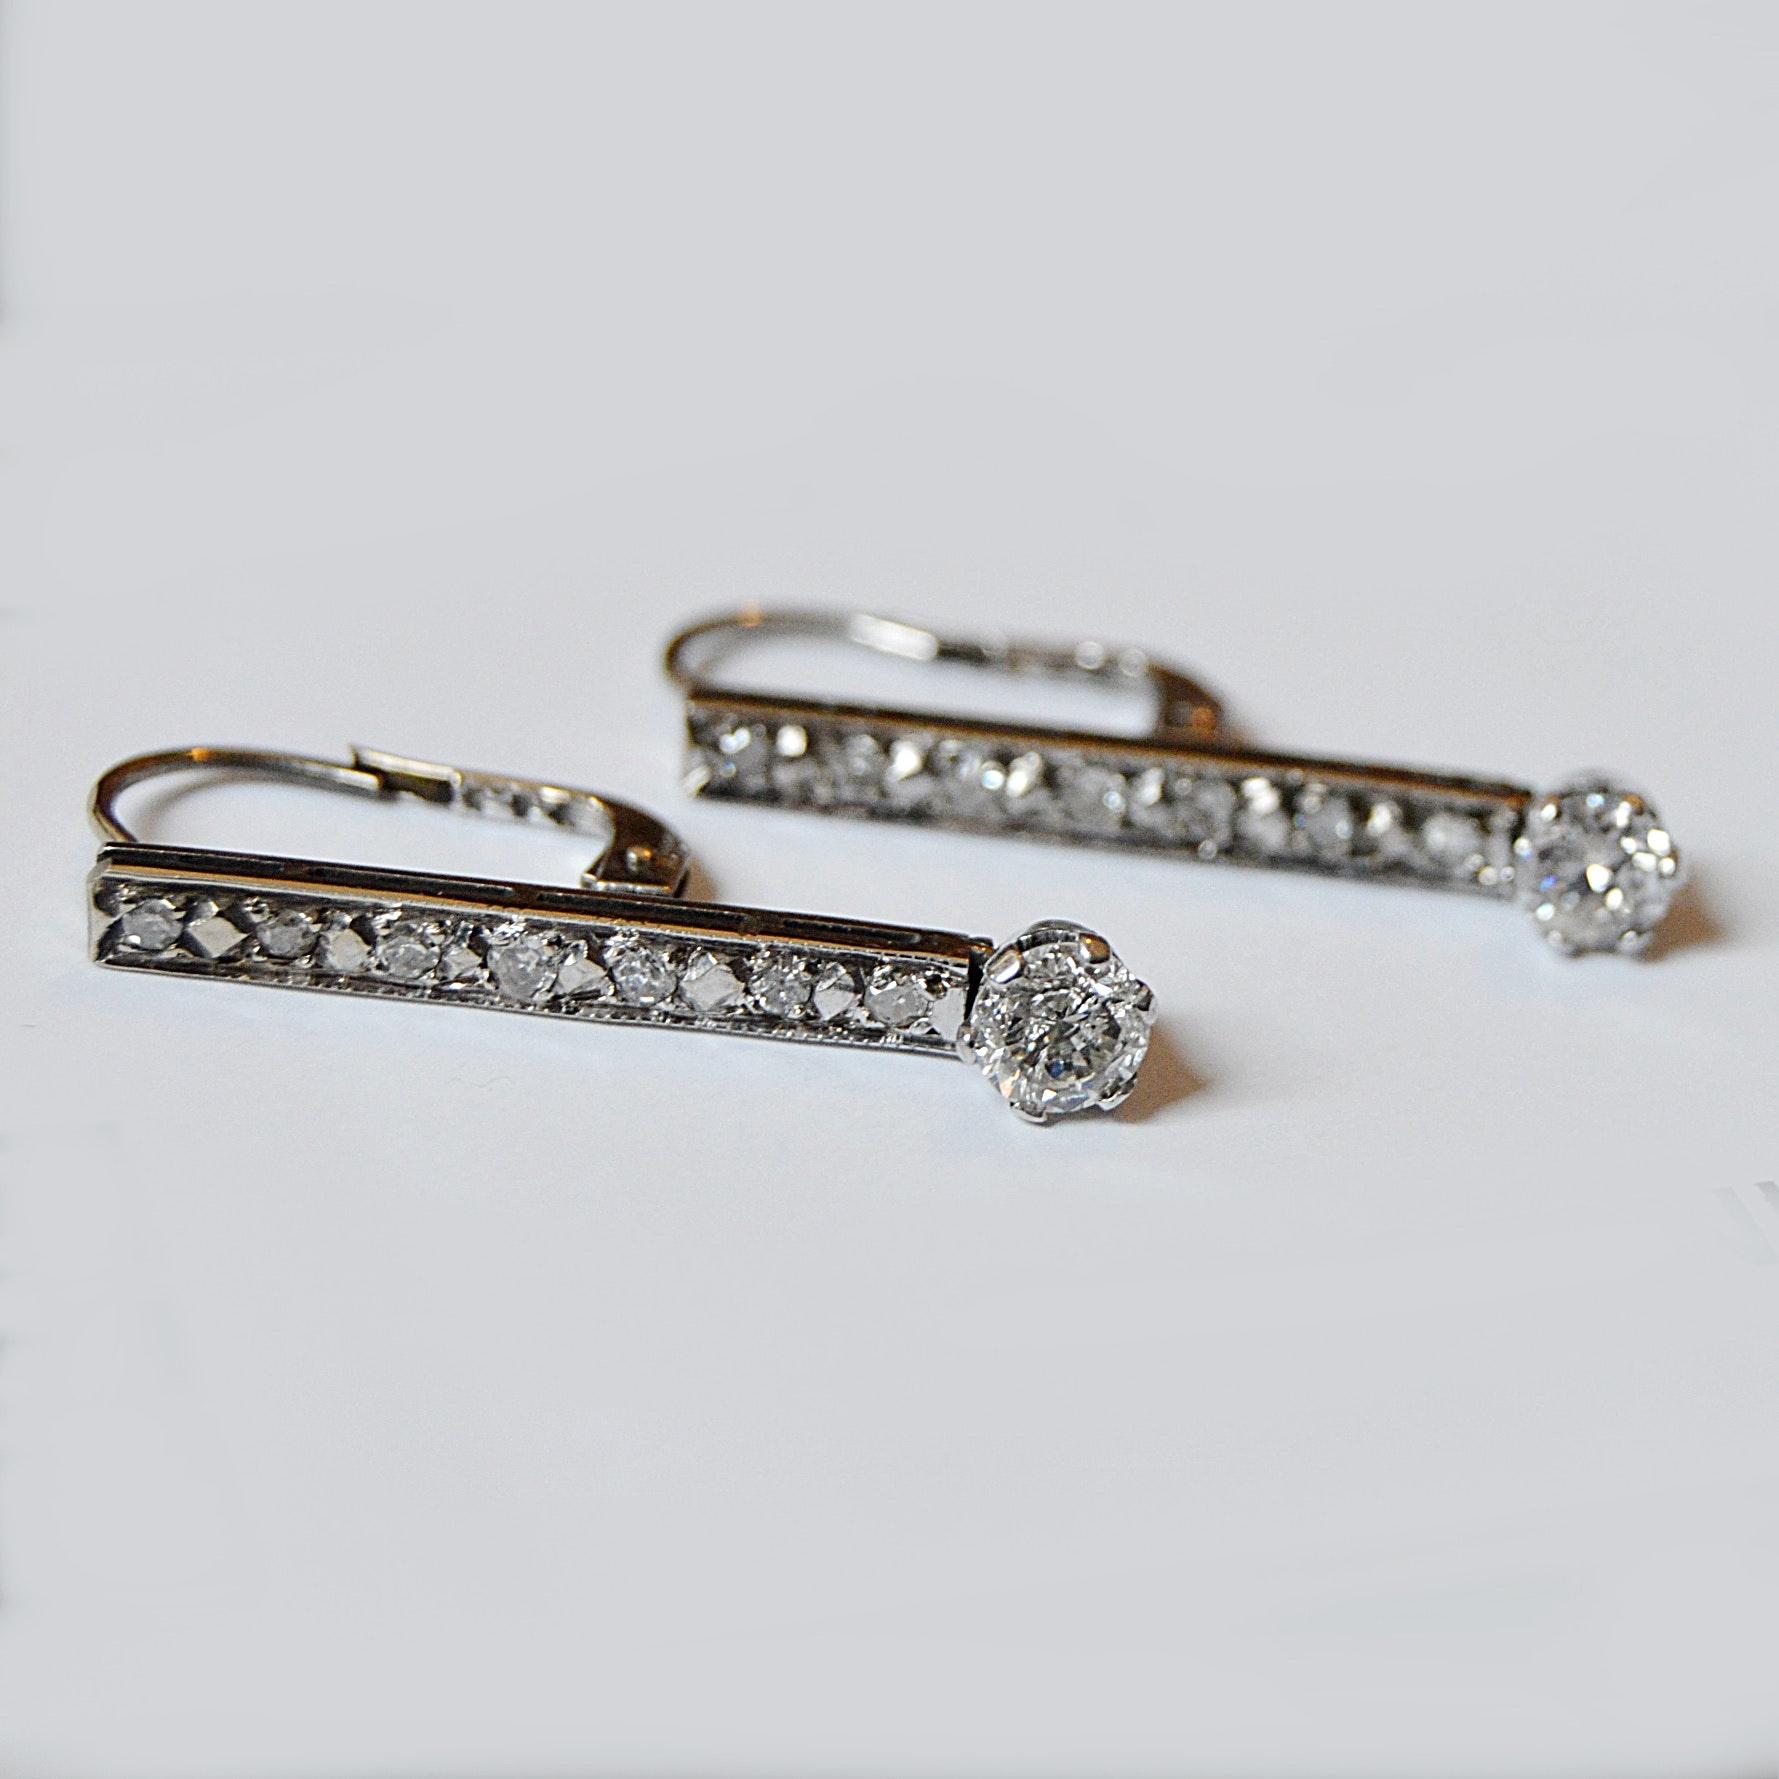 10K White Gold and Diamond Pierced Earrings